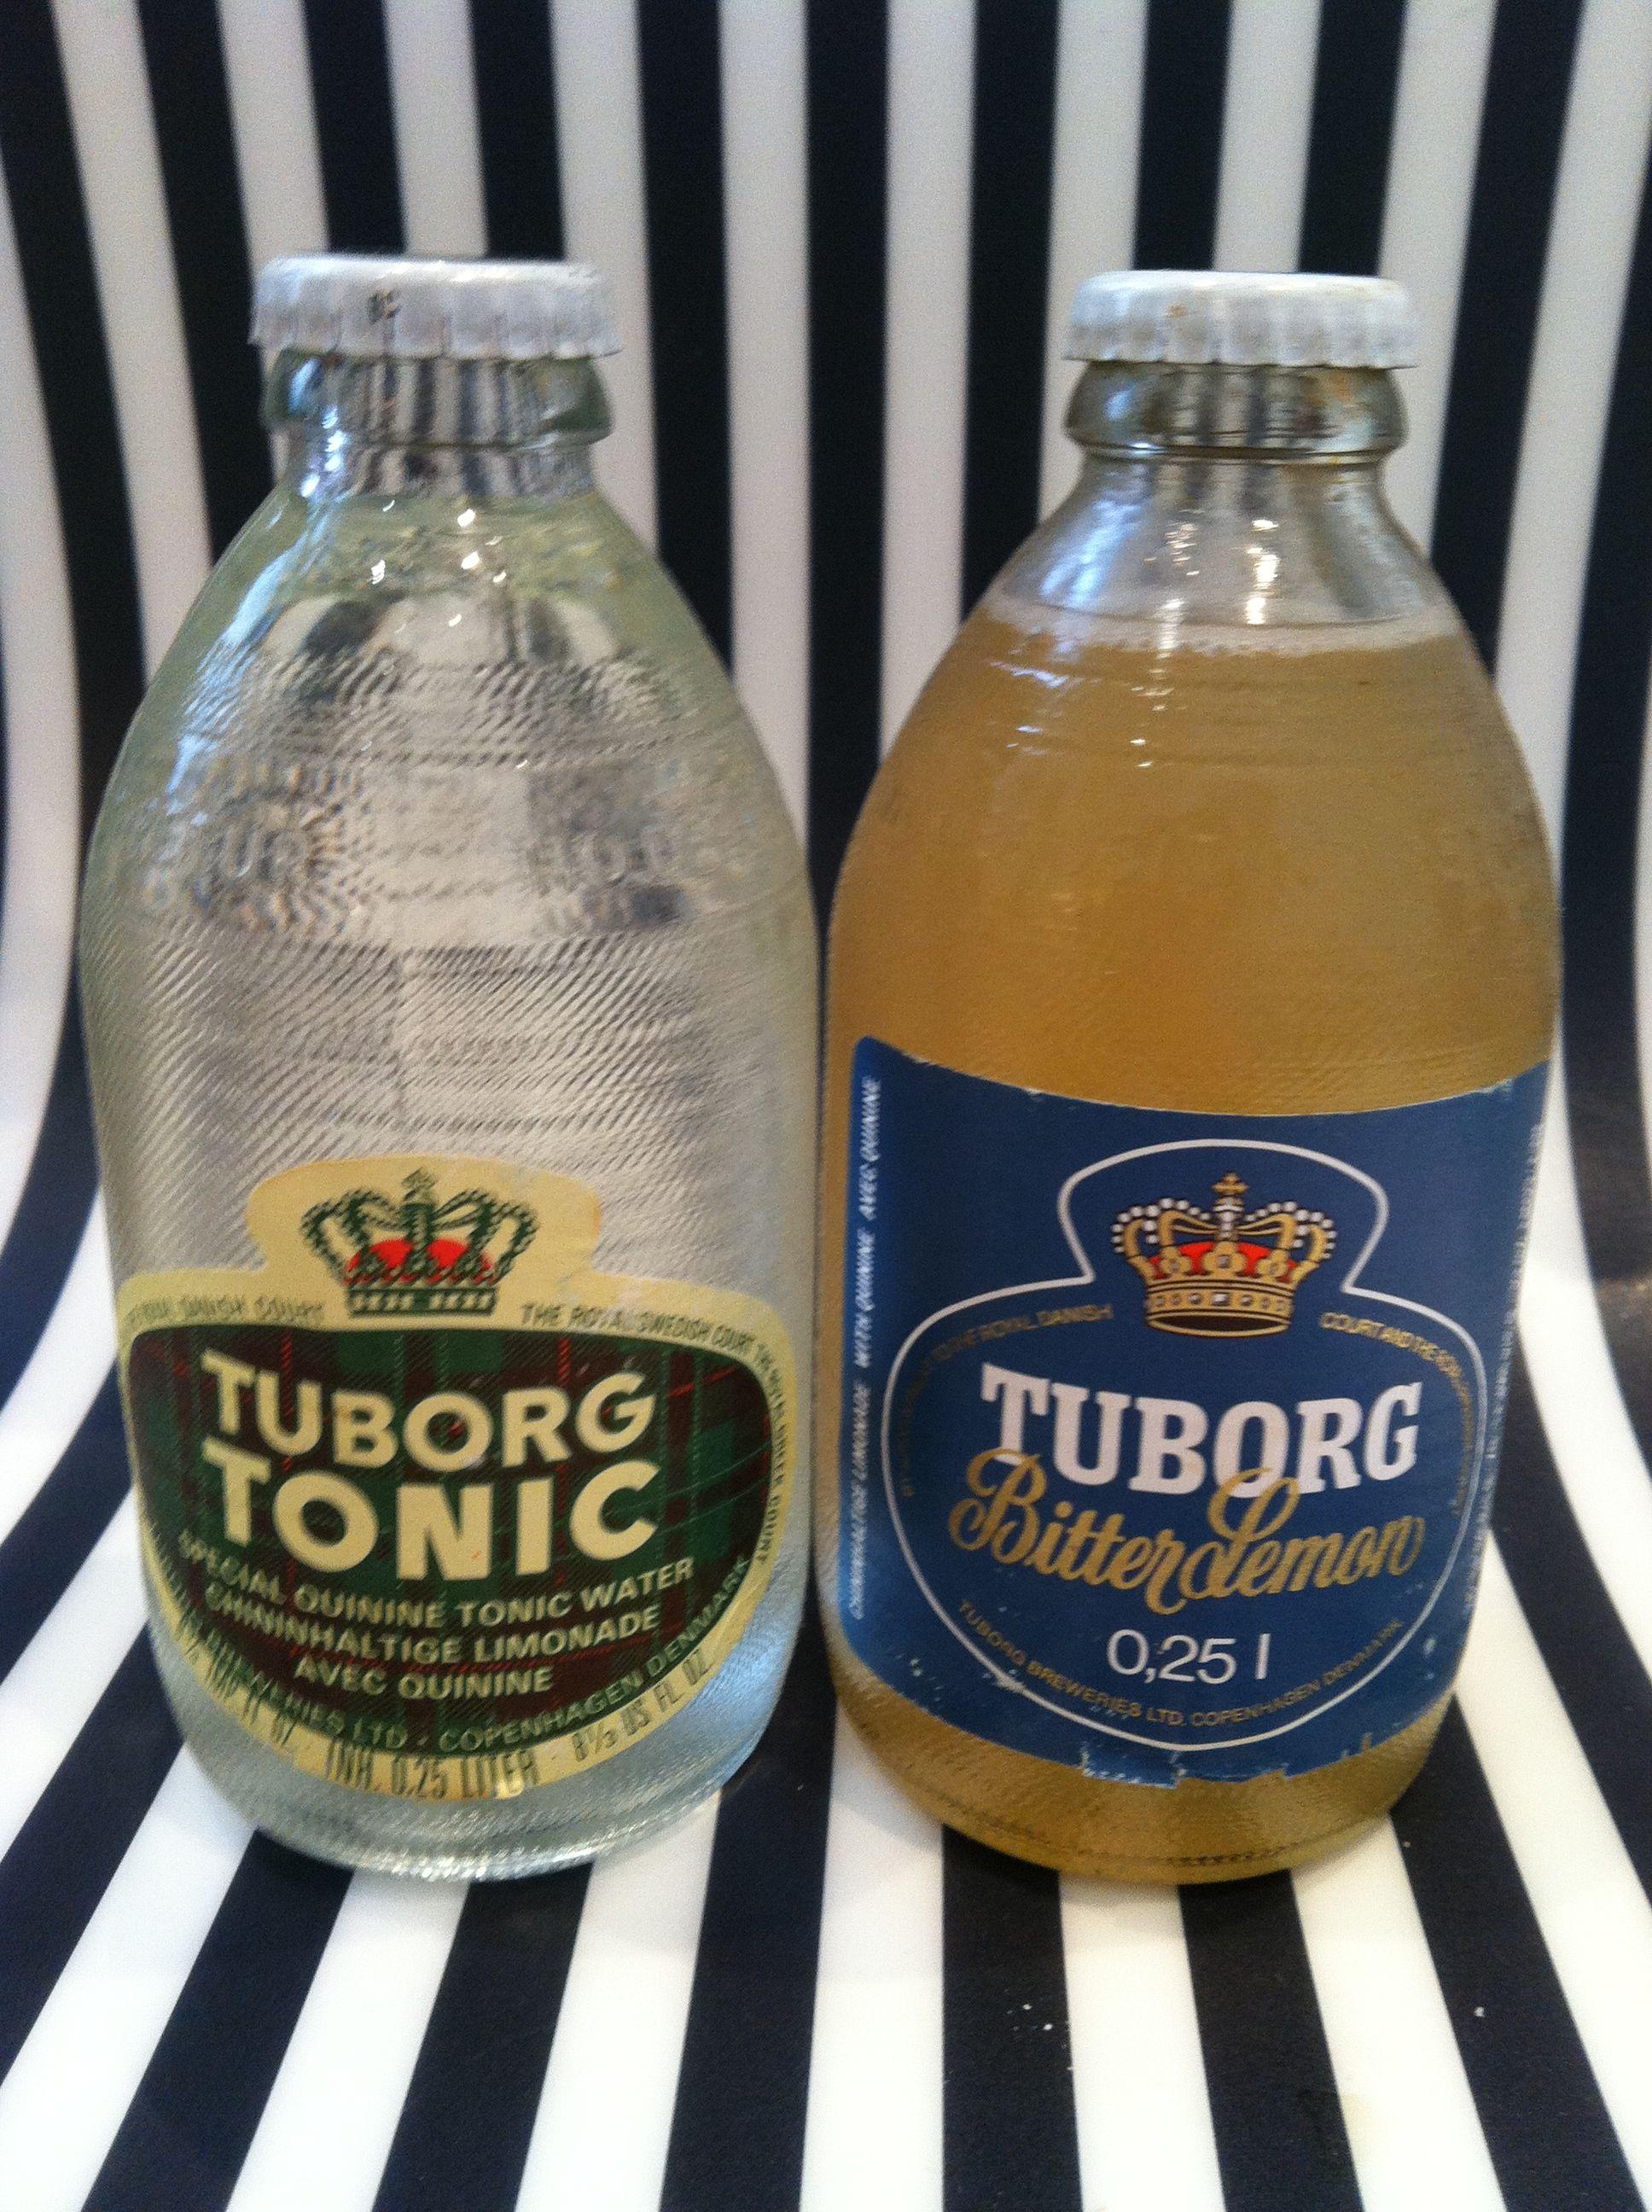 Super tuborg tonic water, tuborg bitter lemon, photocredit andrea pickl  JJ89